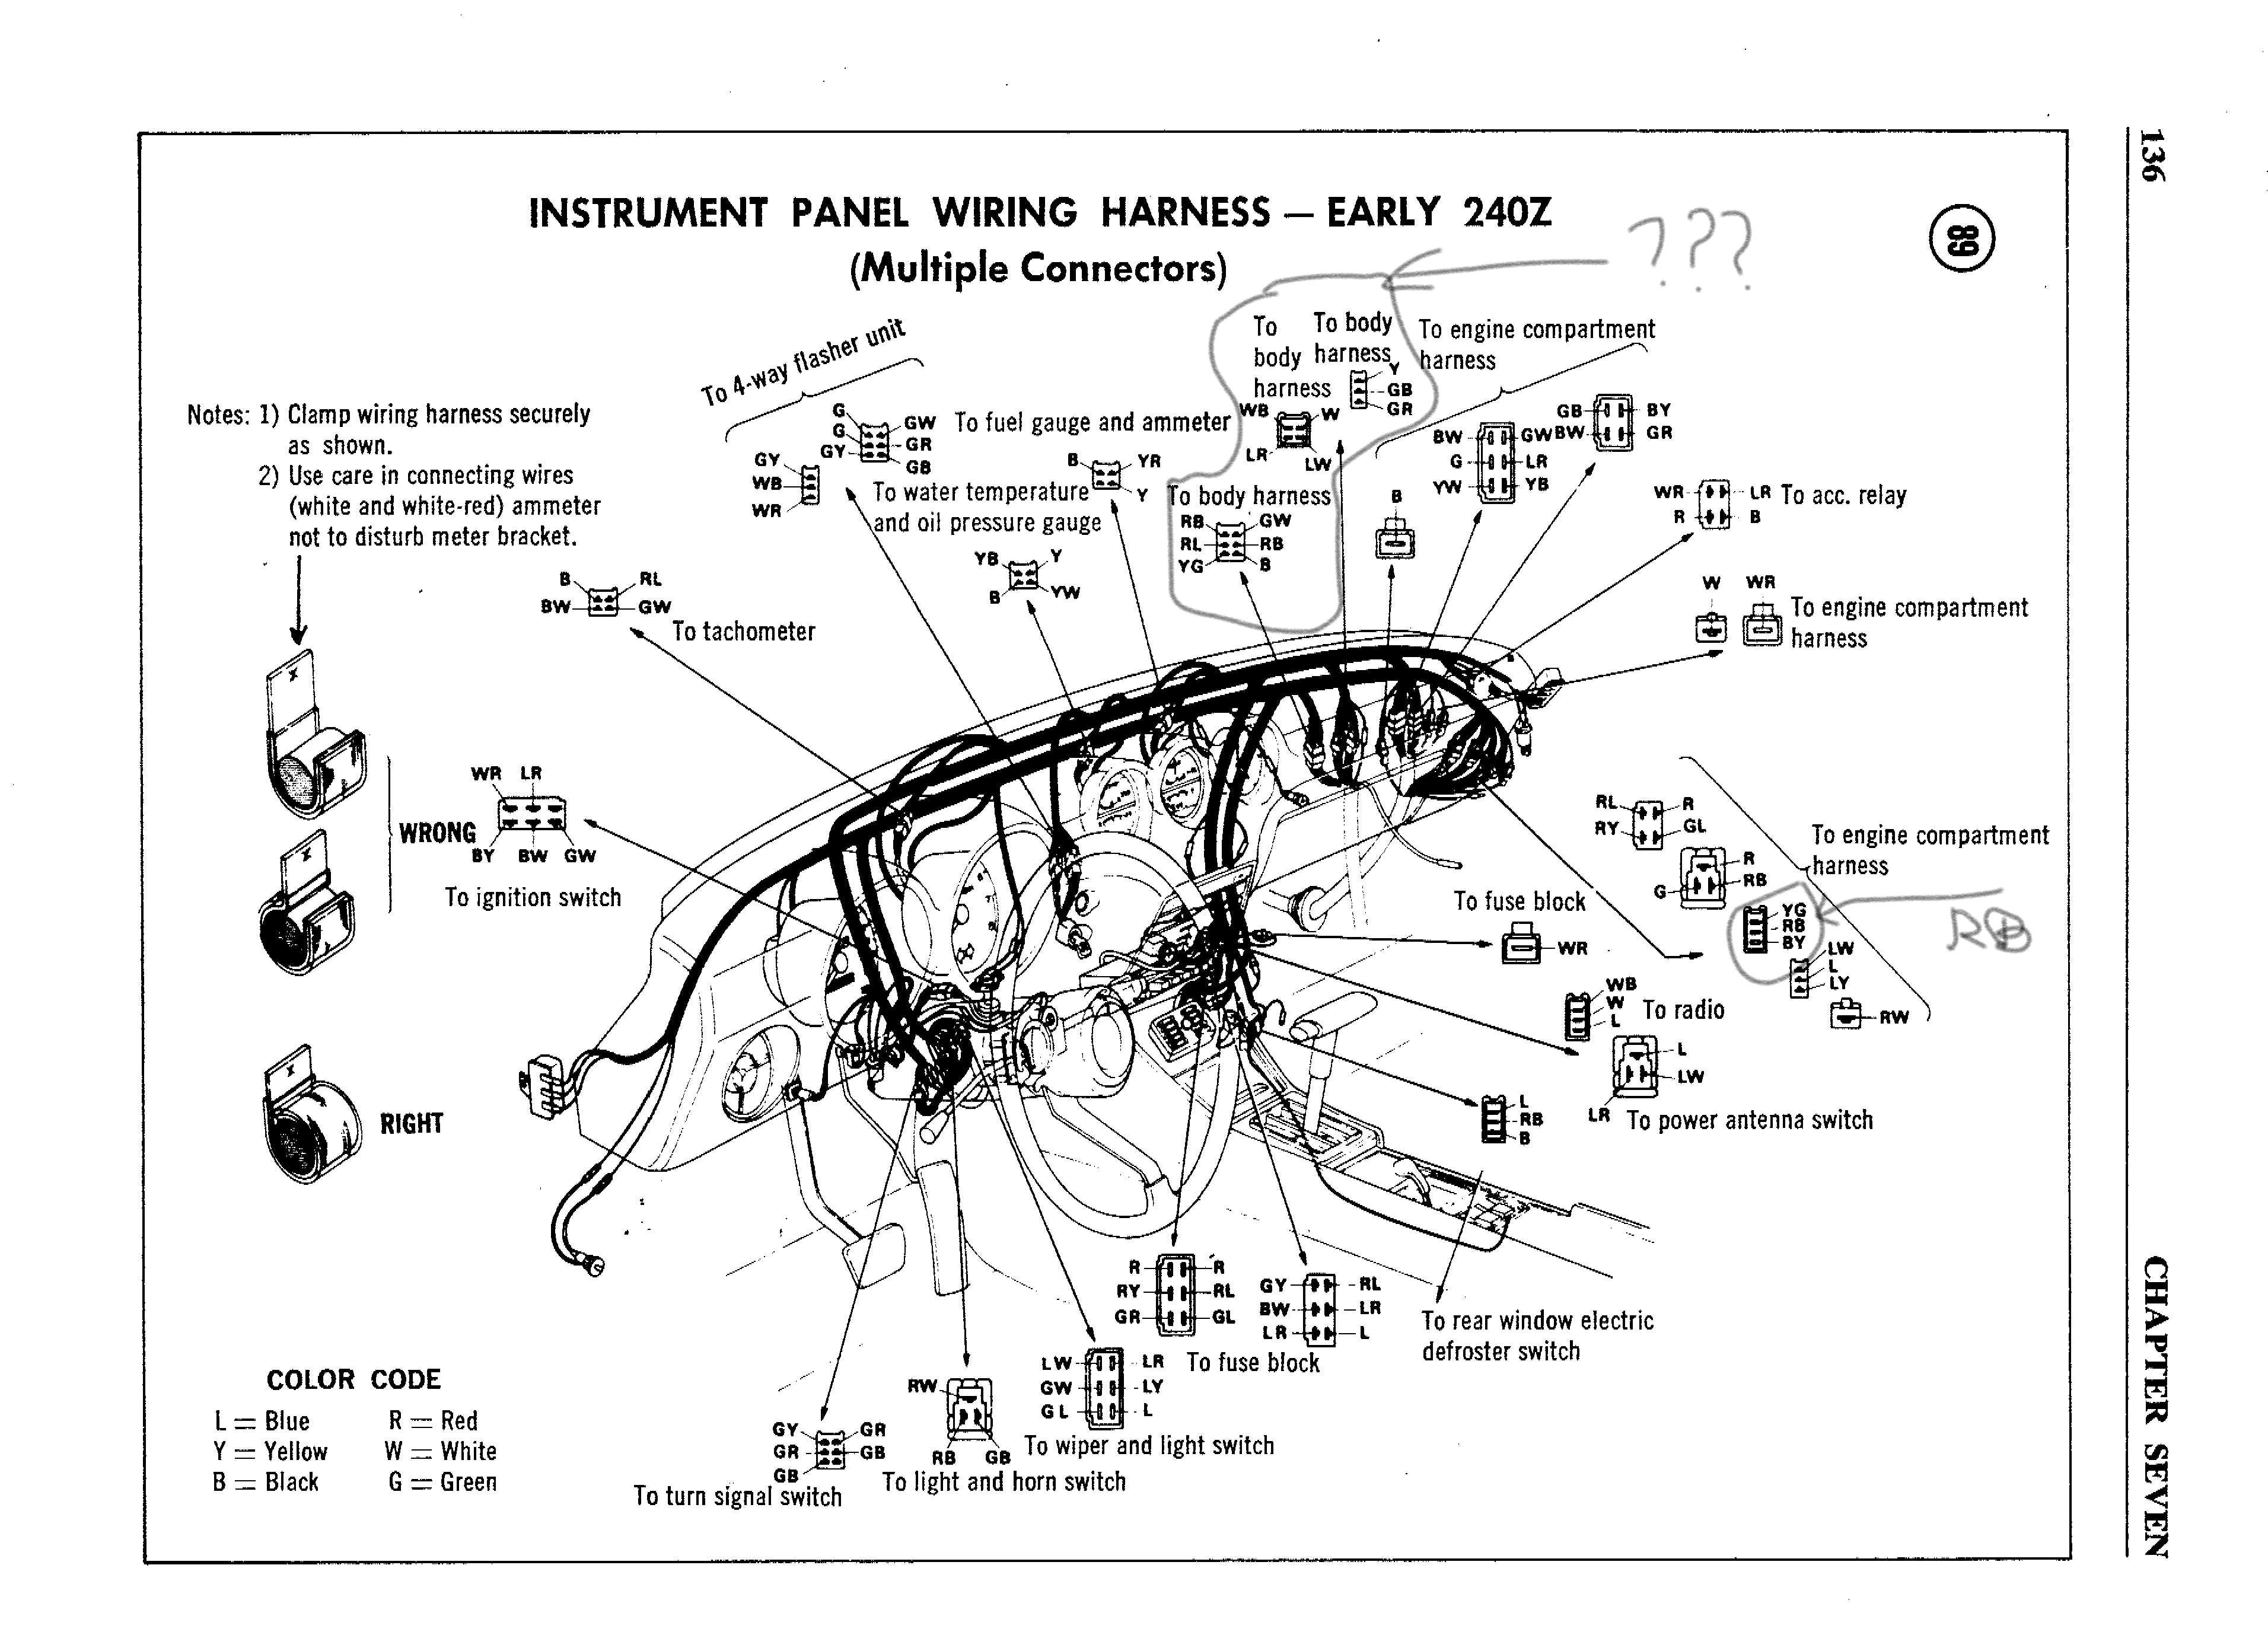 [DIAGRAM_3ER]  AX_3299] 240Z Serie I Color Wiring Diagram Page 2 Electrical Classic Zcar  Free Diagram | 240z Wiring Diagram |  | Targ Eumqu Omit Lotap Mohammedshrine Librar Wiring 101